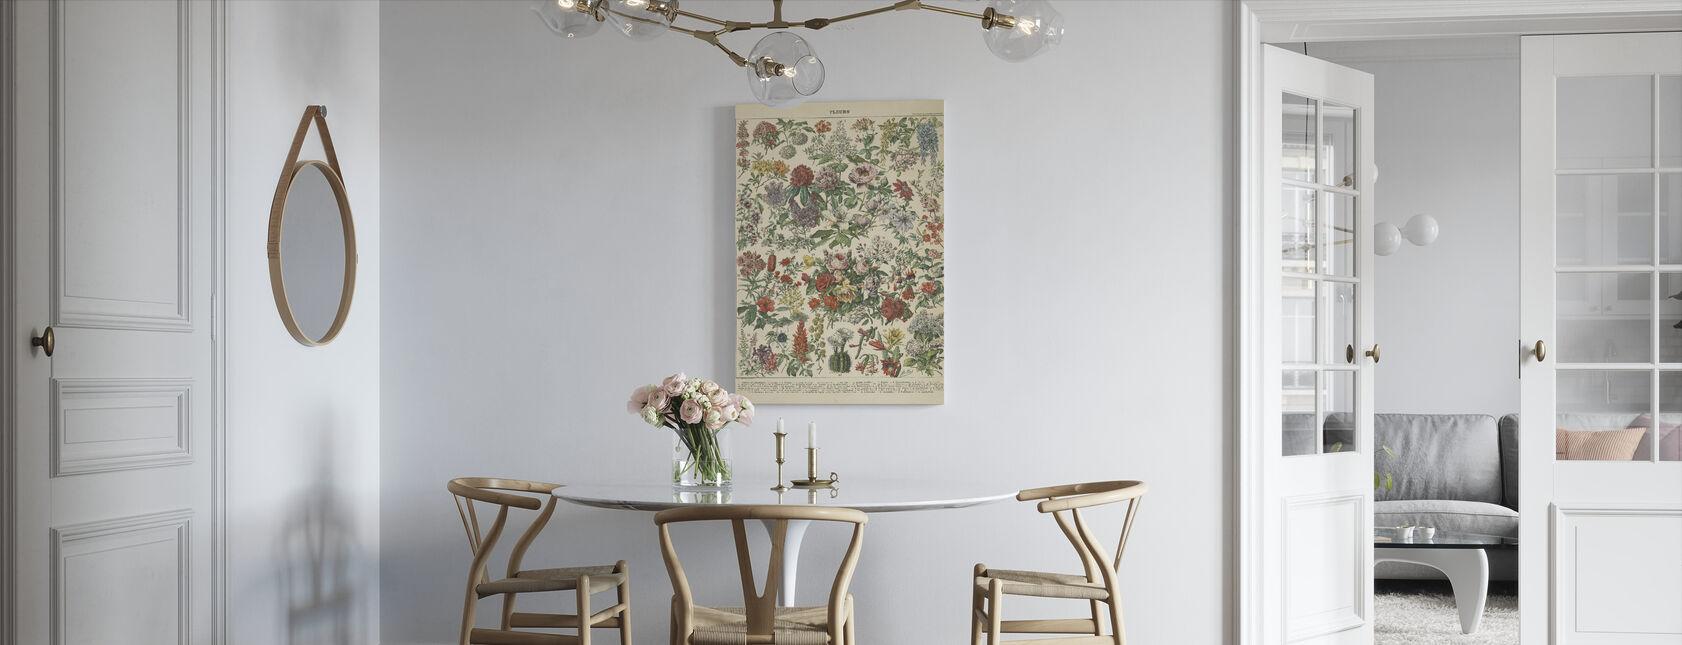 Franse Bloemenkaart - Canvas print - Keuken